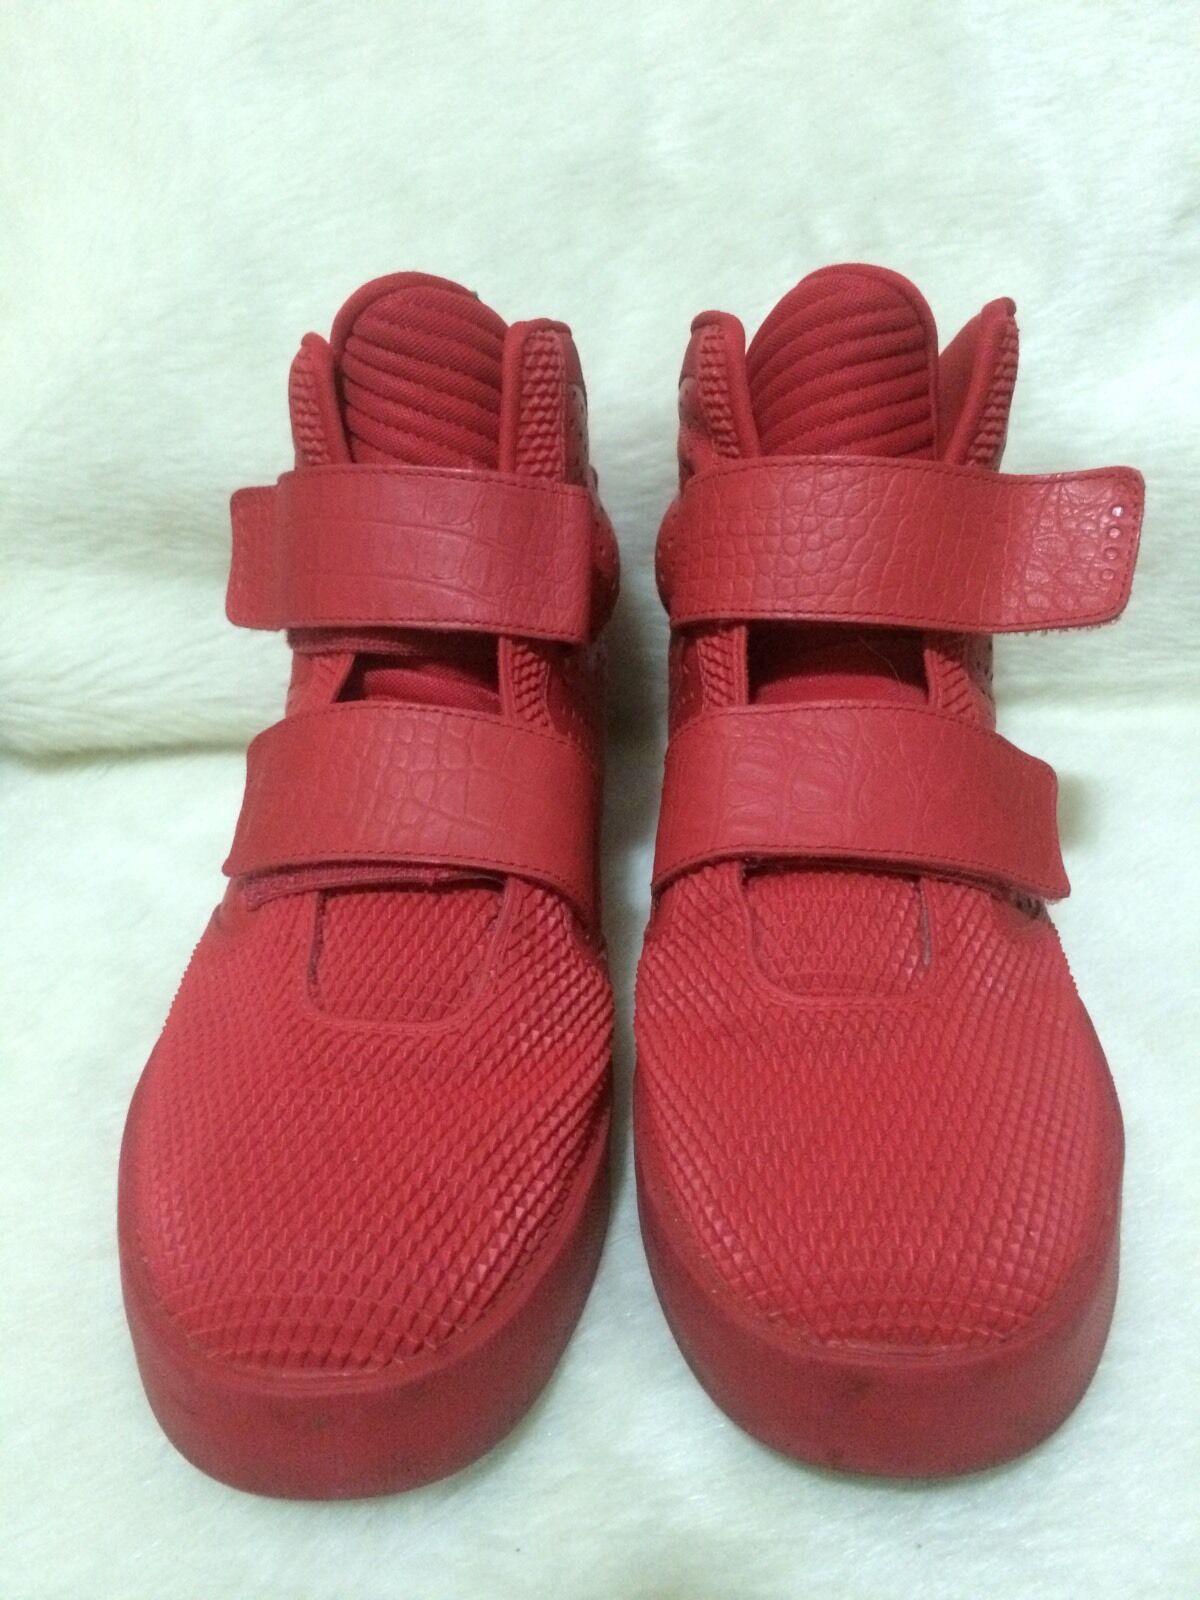 Nike jordan Flystepper 2K3 (677473-601 Red jordan Nike 1,3,4  Shoes, Men Size 12 5122de